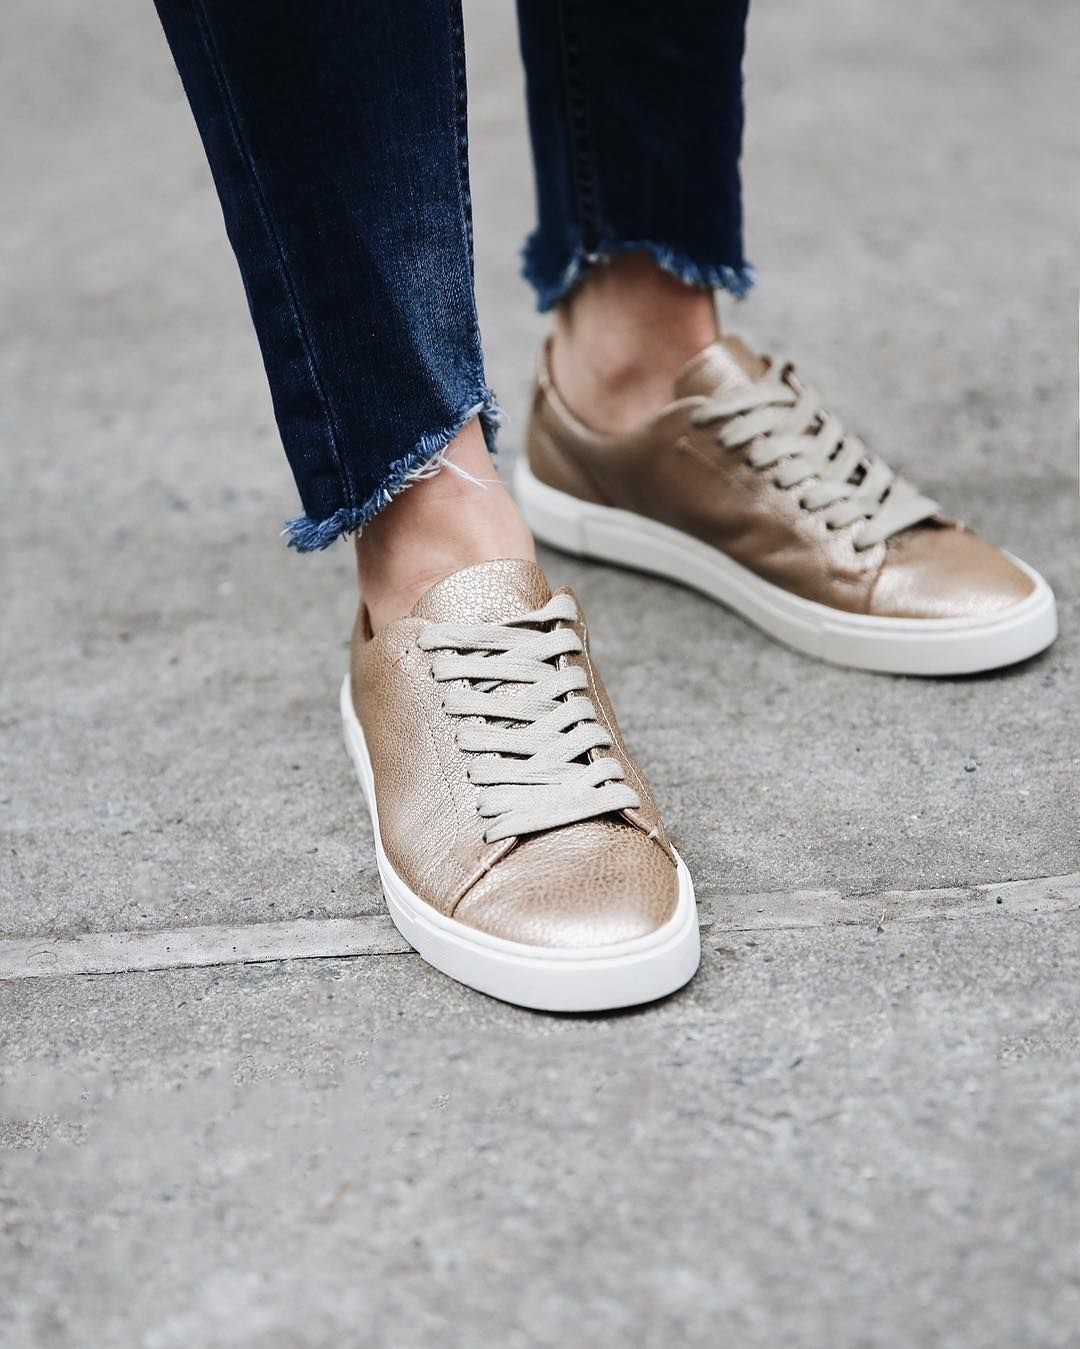 Frye Womens Tennis Shoes